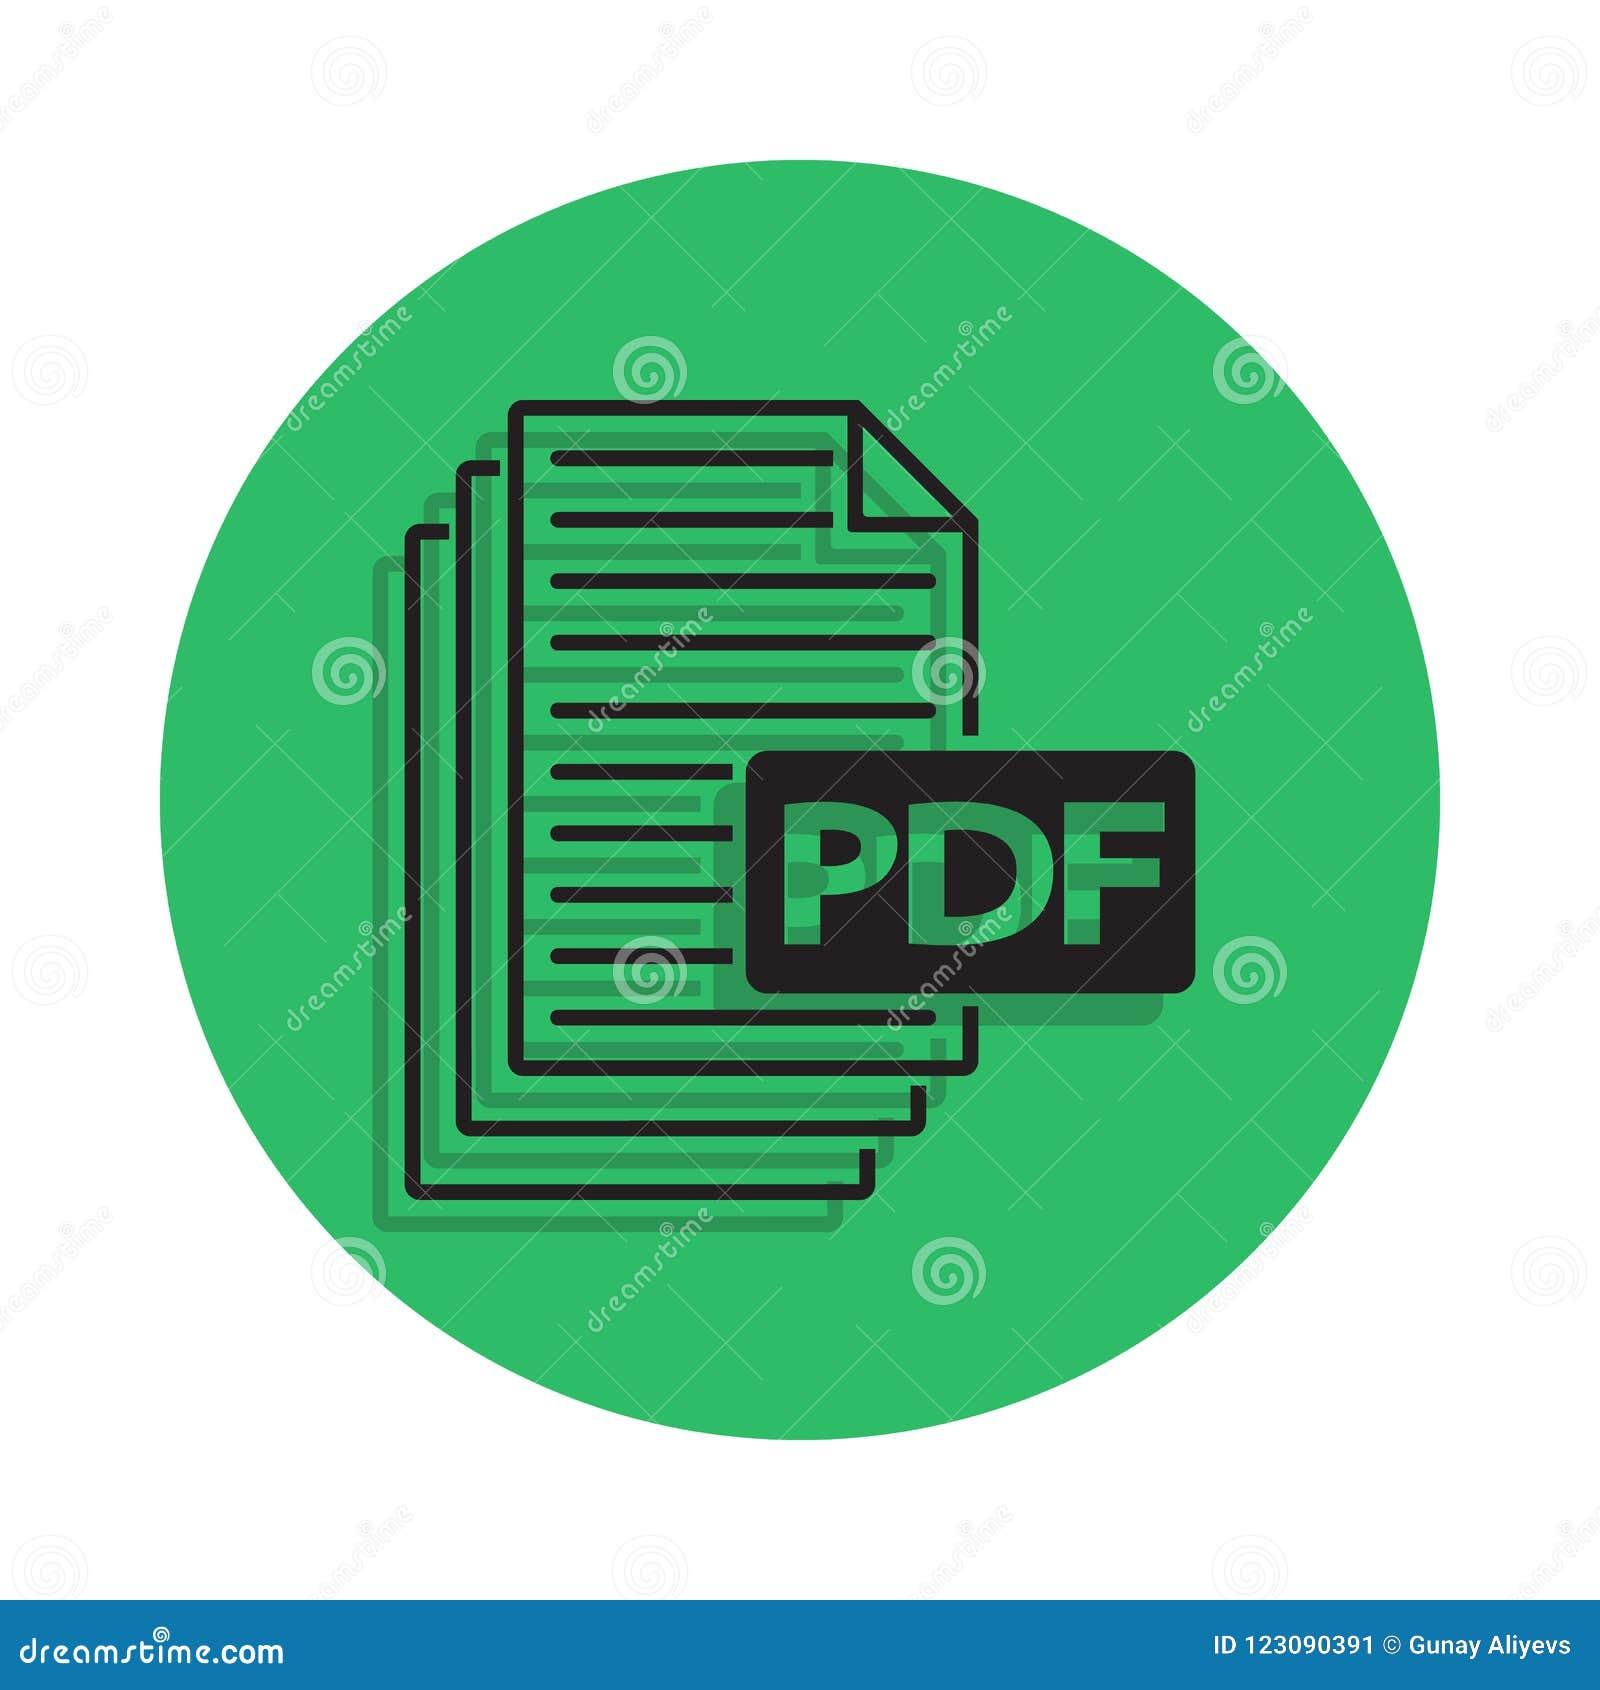 Pdf Format For Mobile